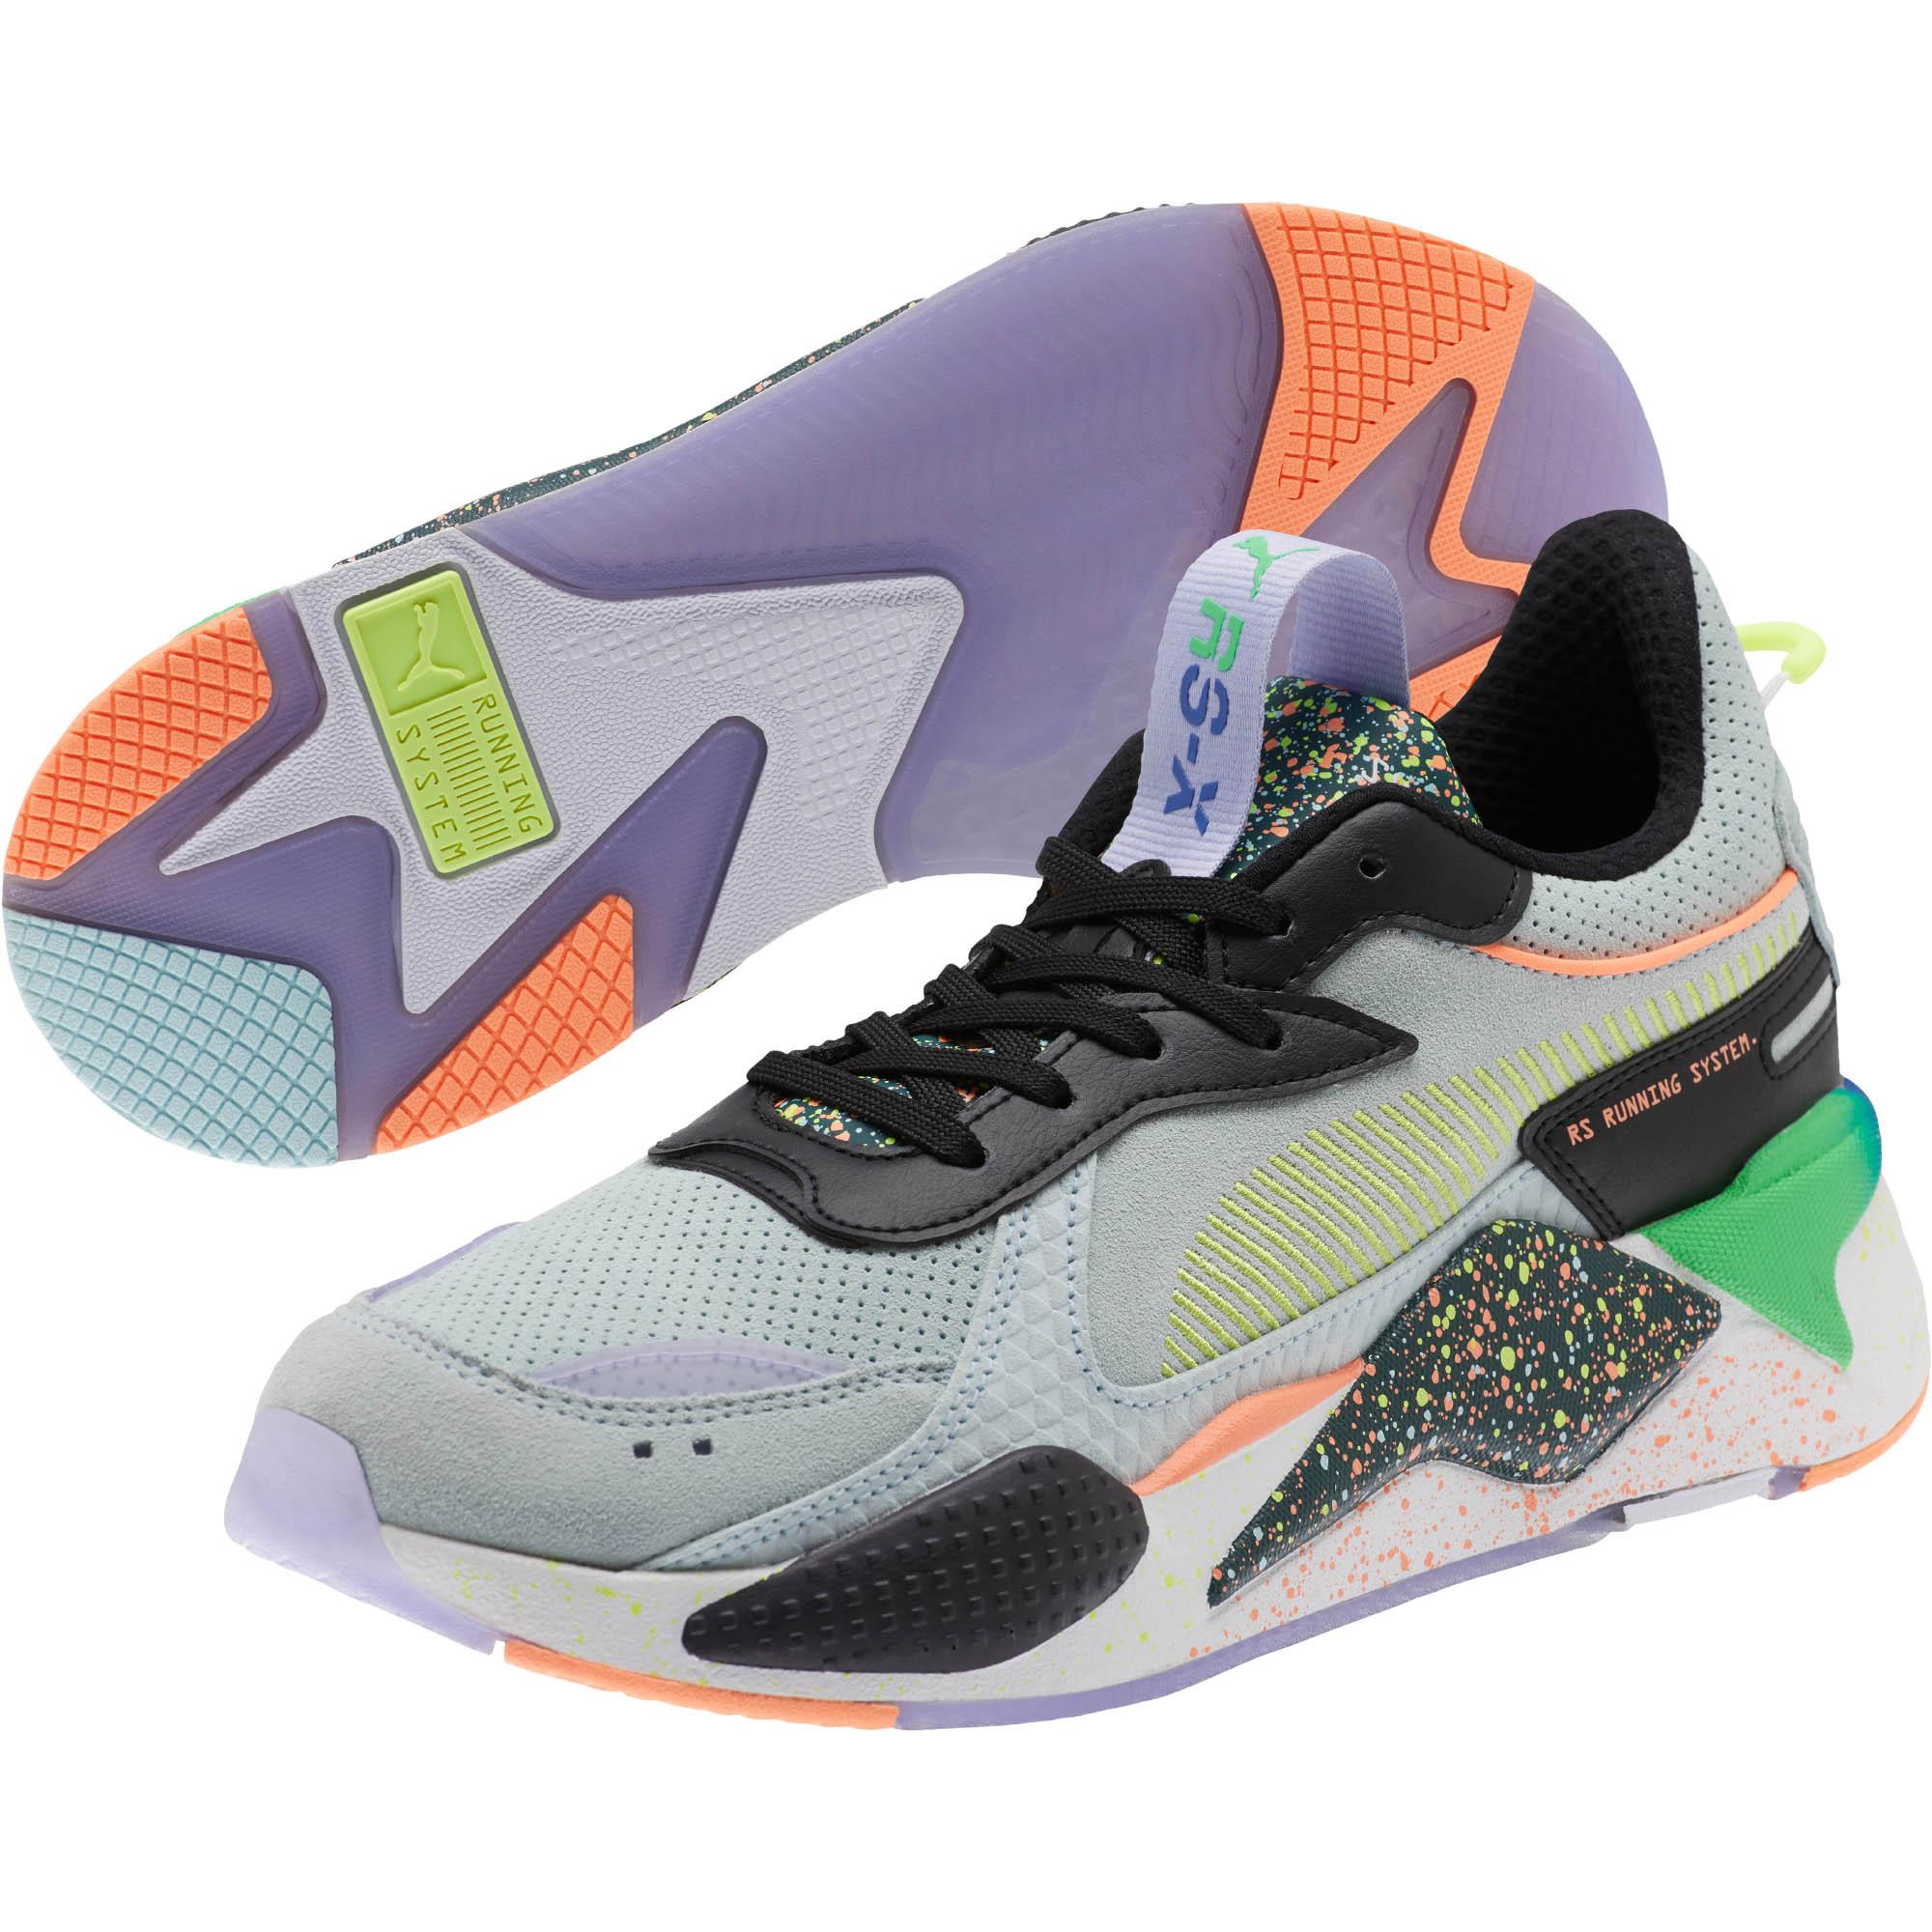 Puma RS-X Bold 372715-05 Herren Schuhe Mehrfarbig Sneakers